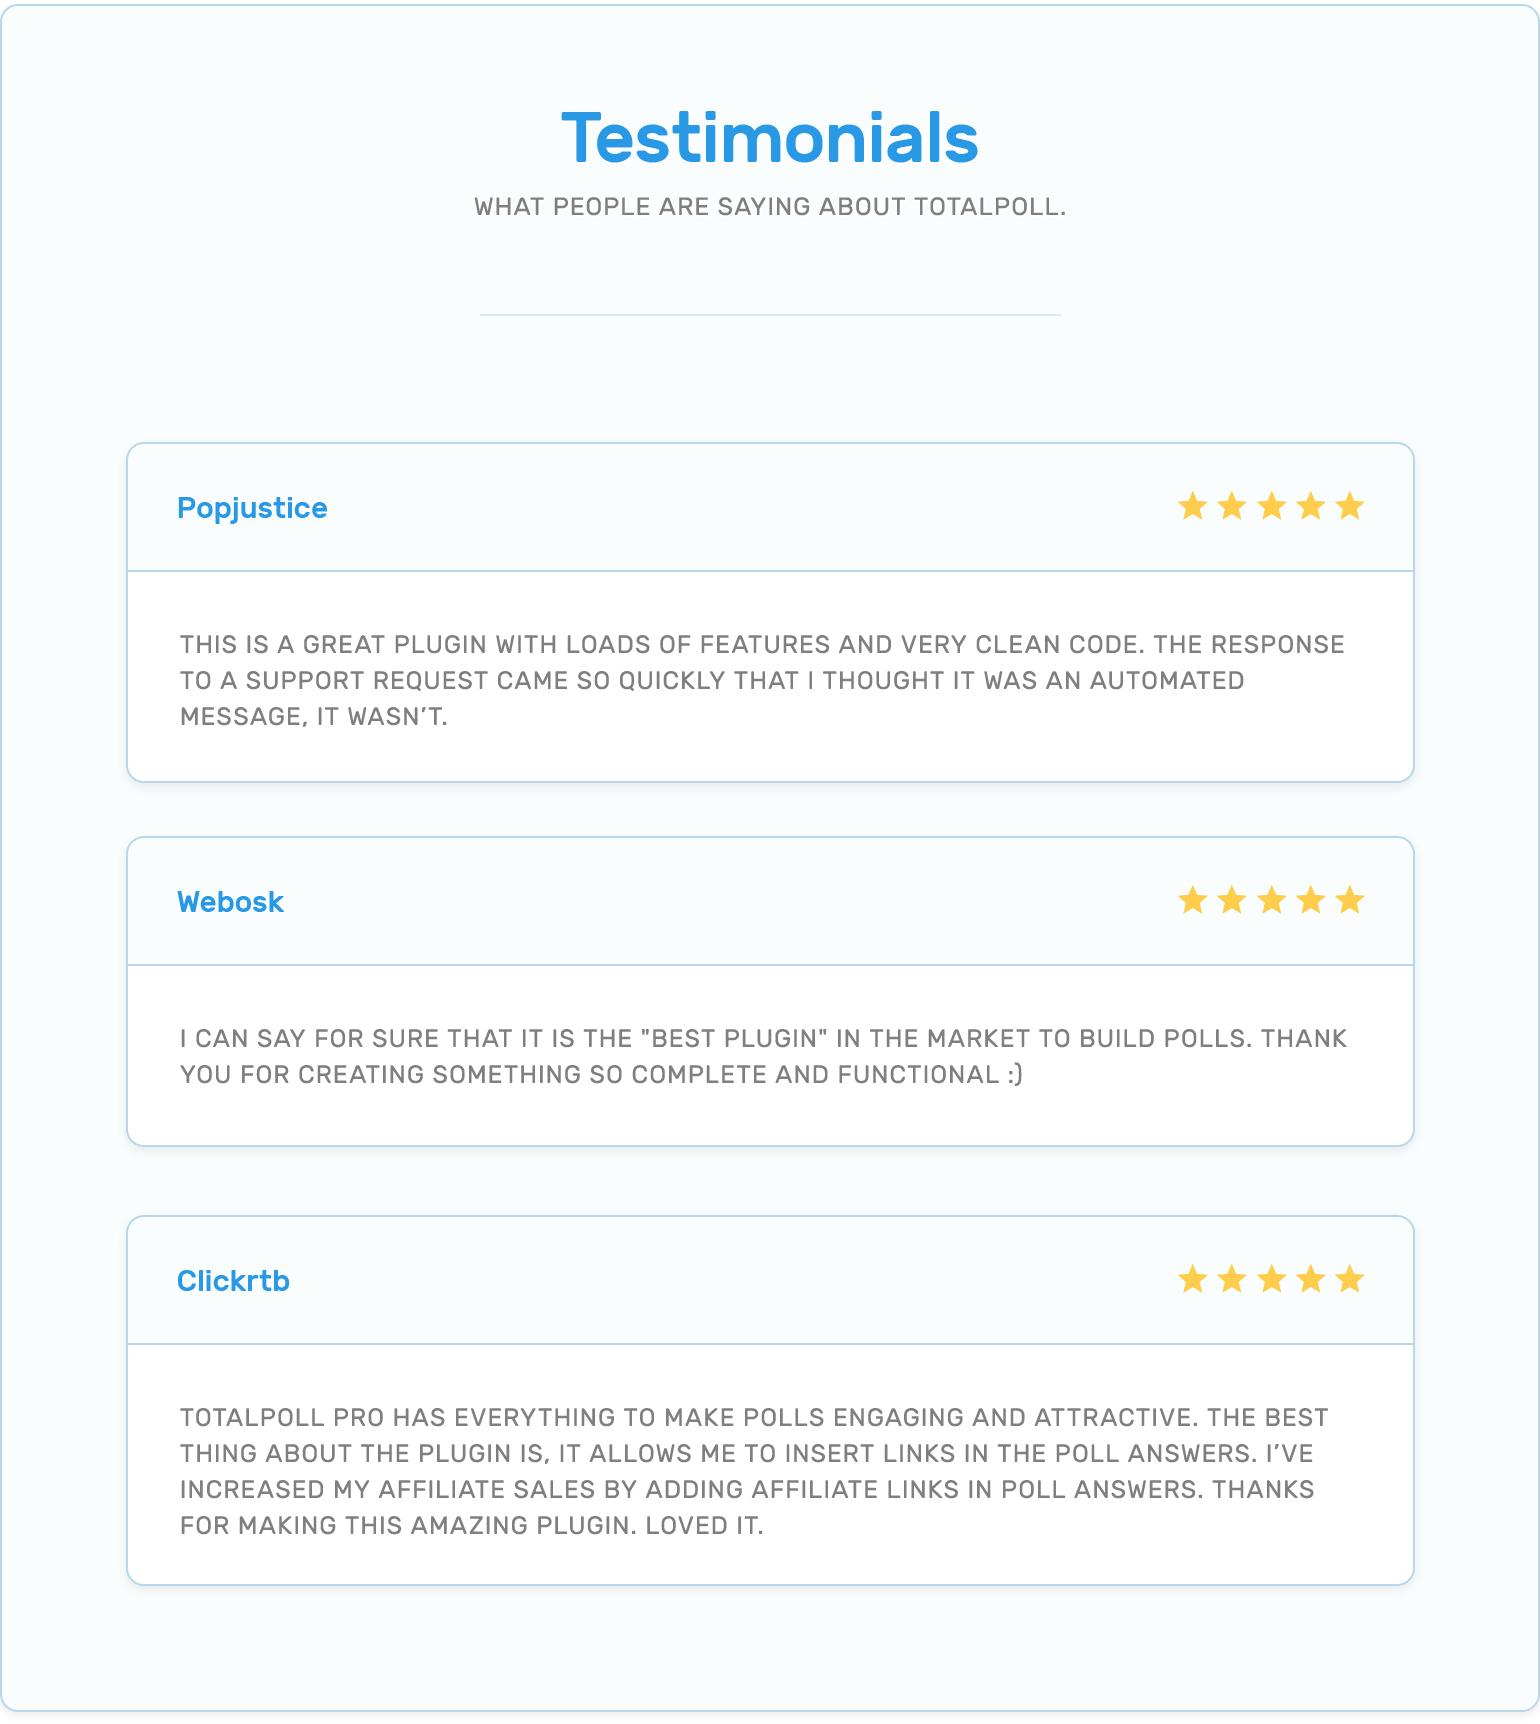 Testimonials of customers who used TotalPoll.